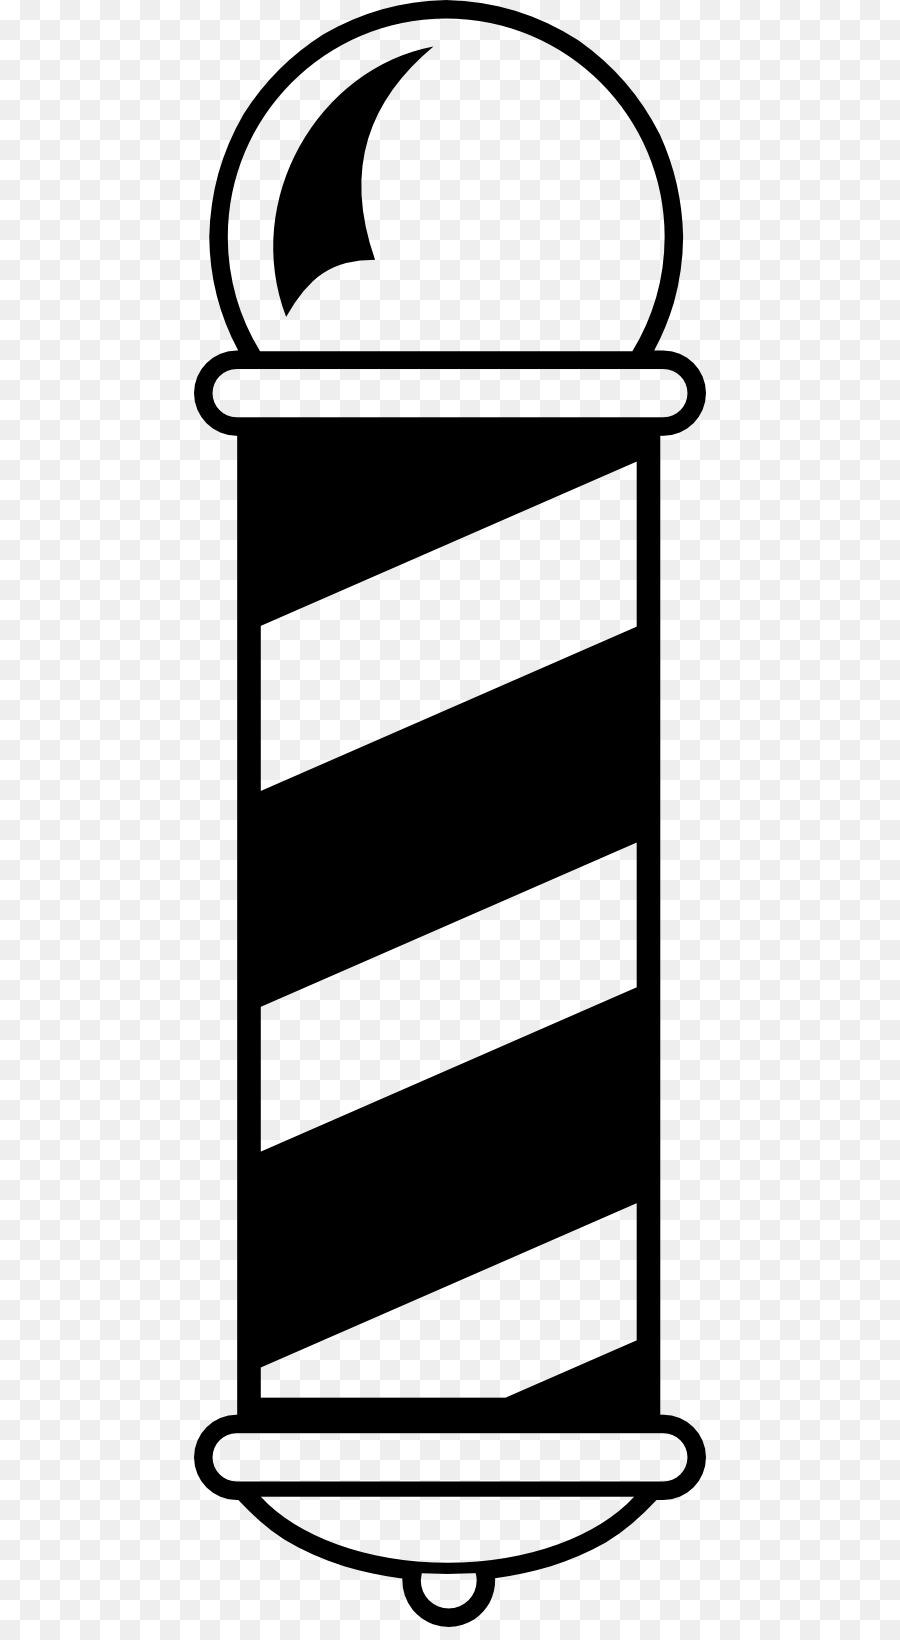 barber s pole hairstyle clip art barbershop png download 512 rh kisspng com barber shop clipart logo barber shop clip art color